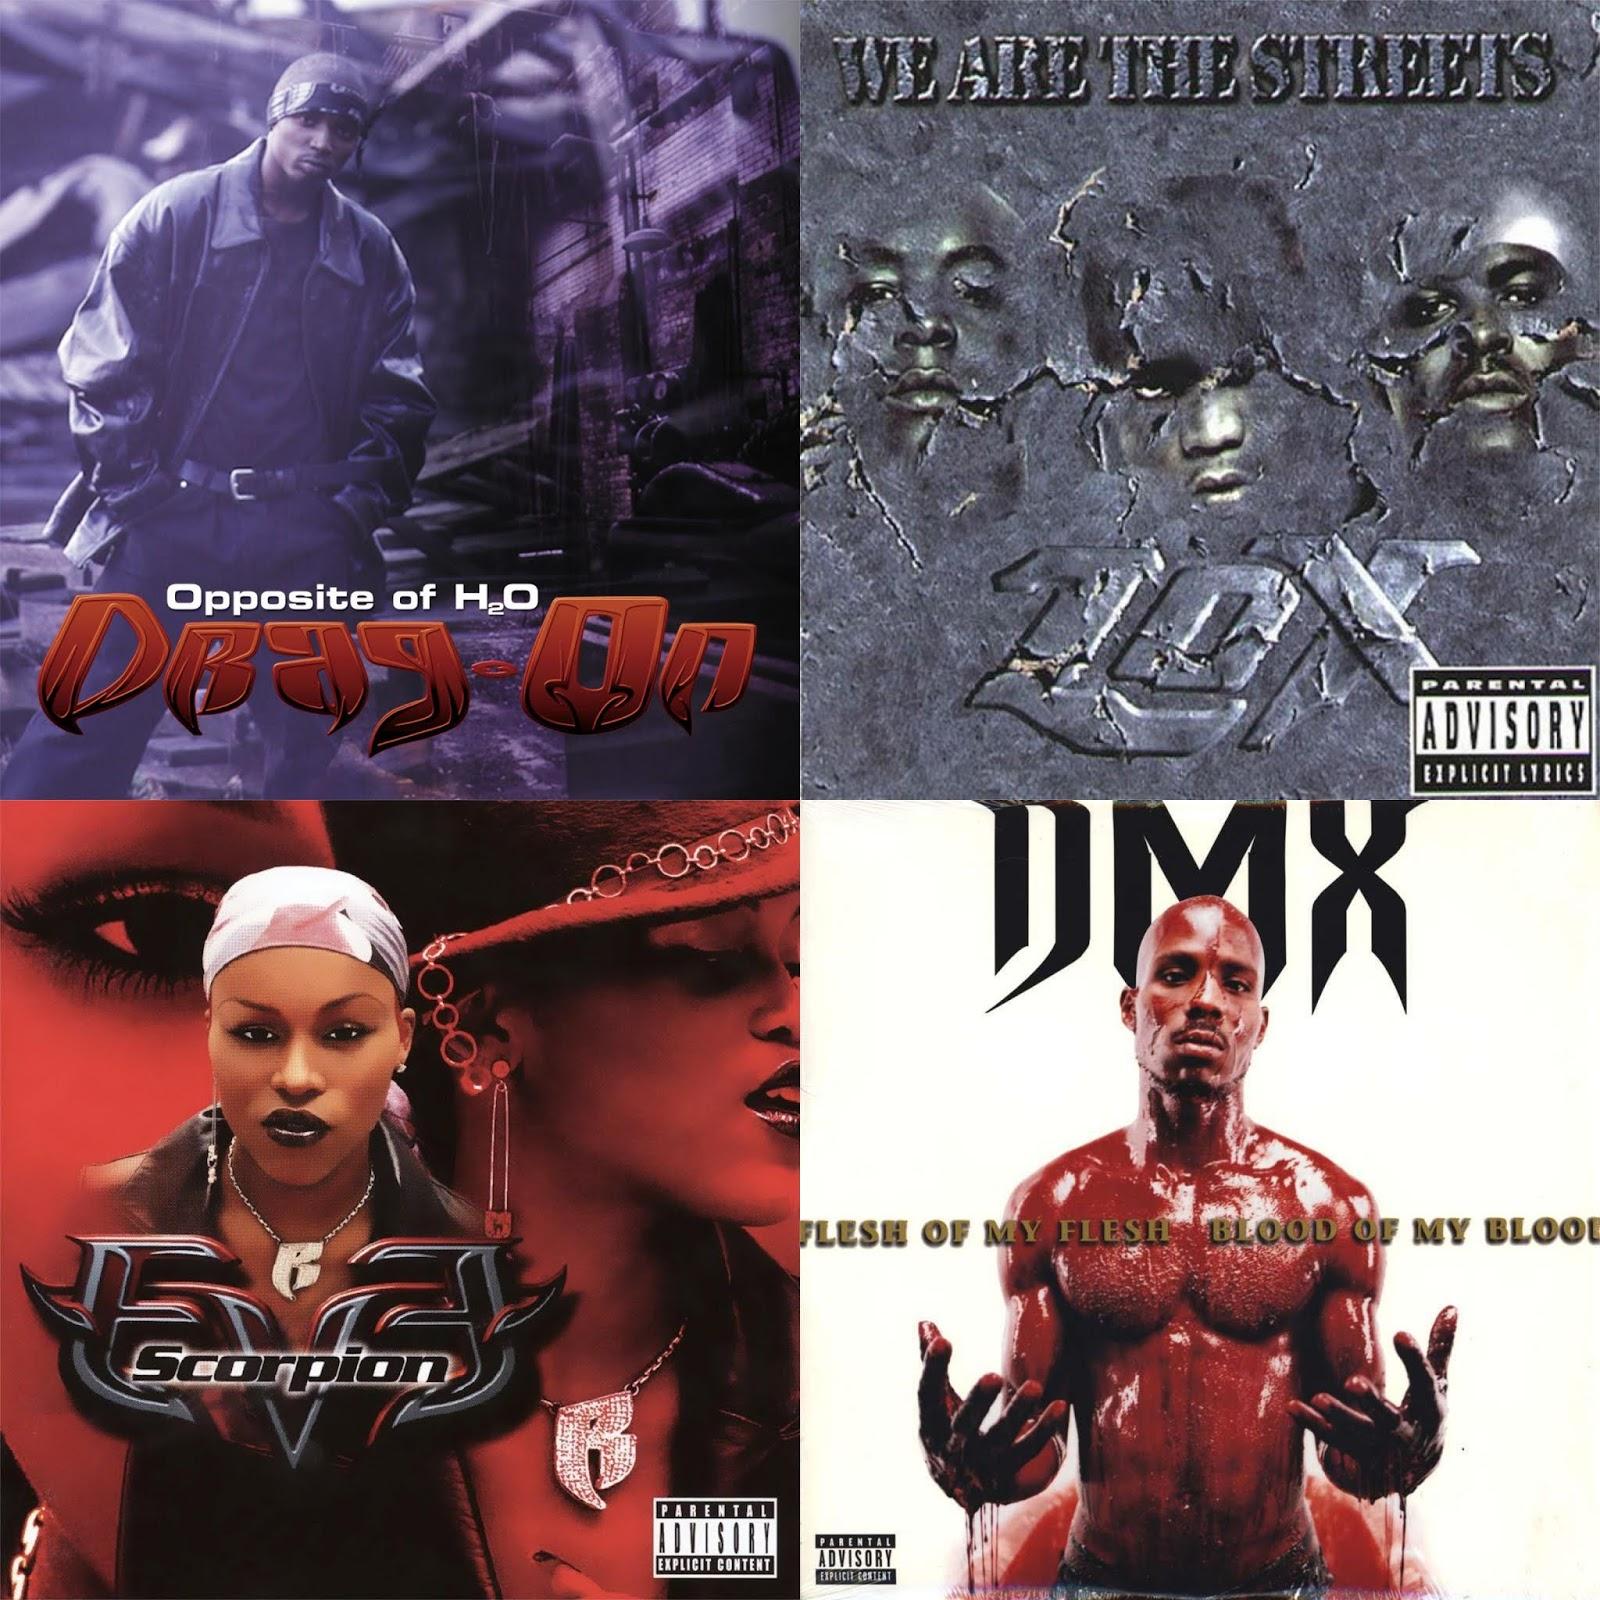 DAR Hip Hop: The Greatest Ruff Ryders Artists